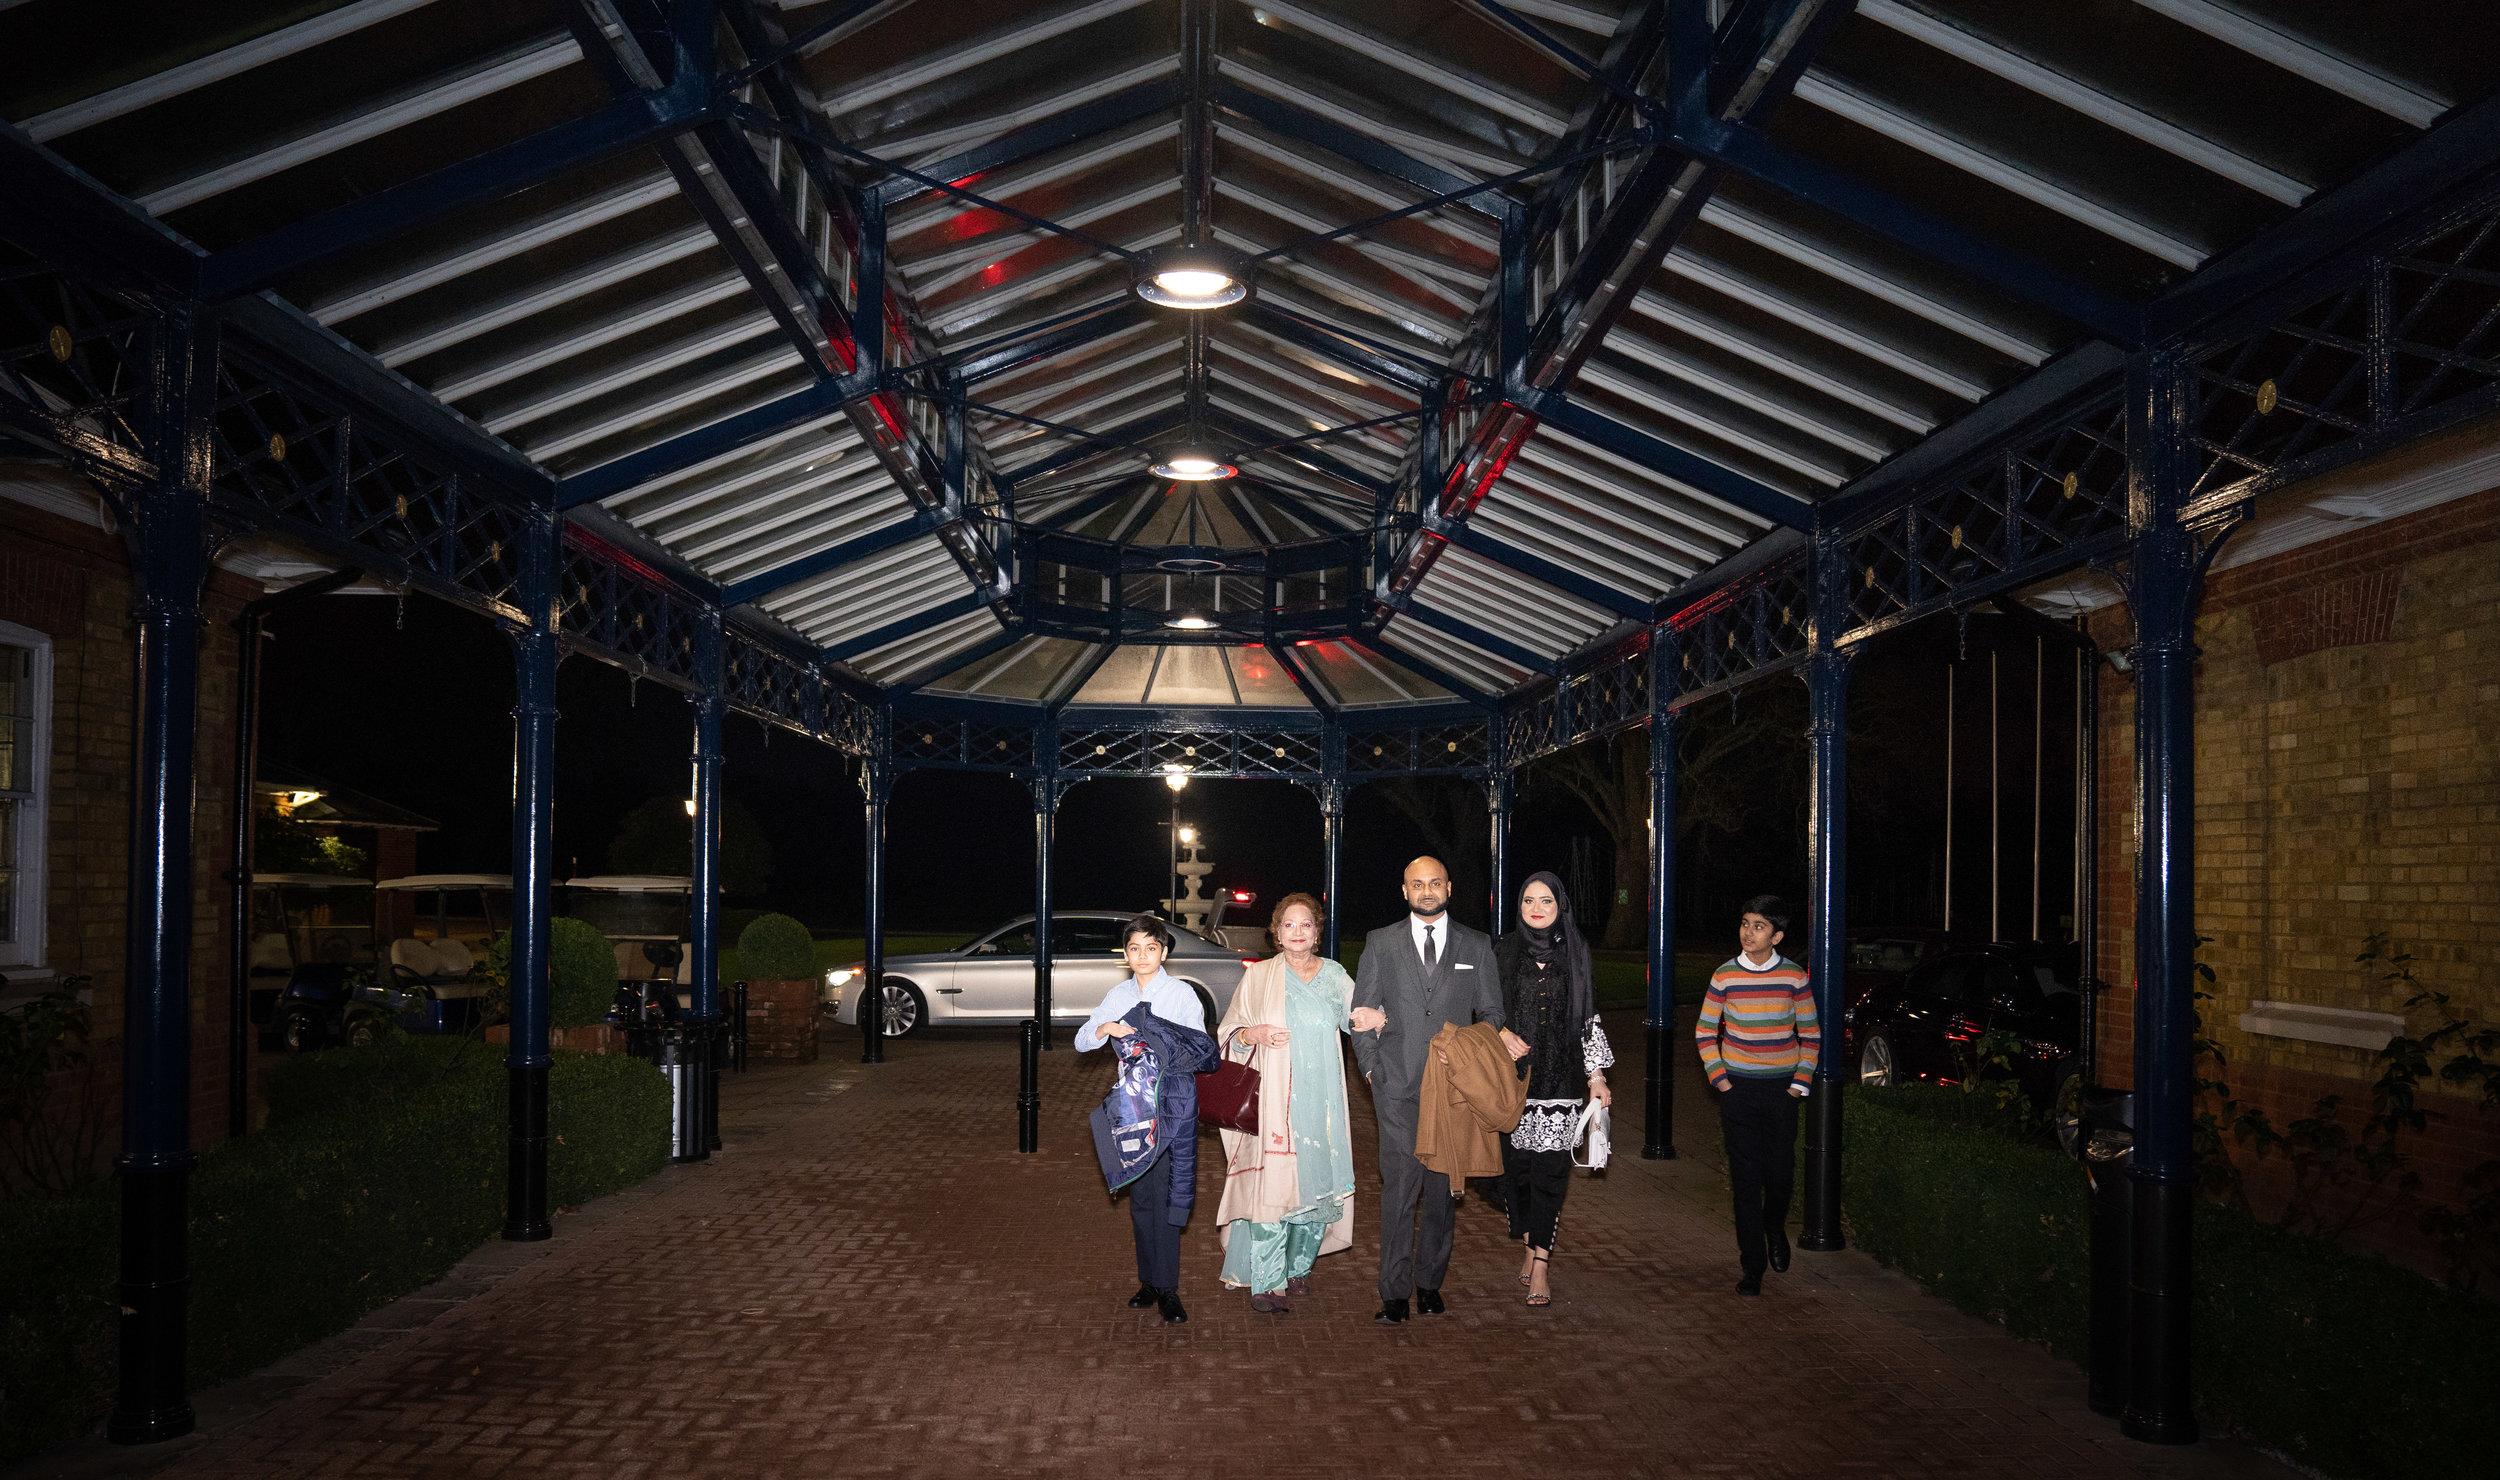 buckinghamshire-golf-club-winter-muslim-wedding-engagement-photography-videography-03